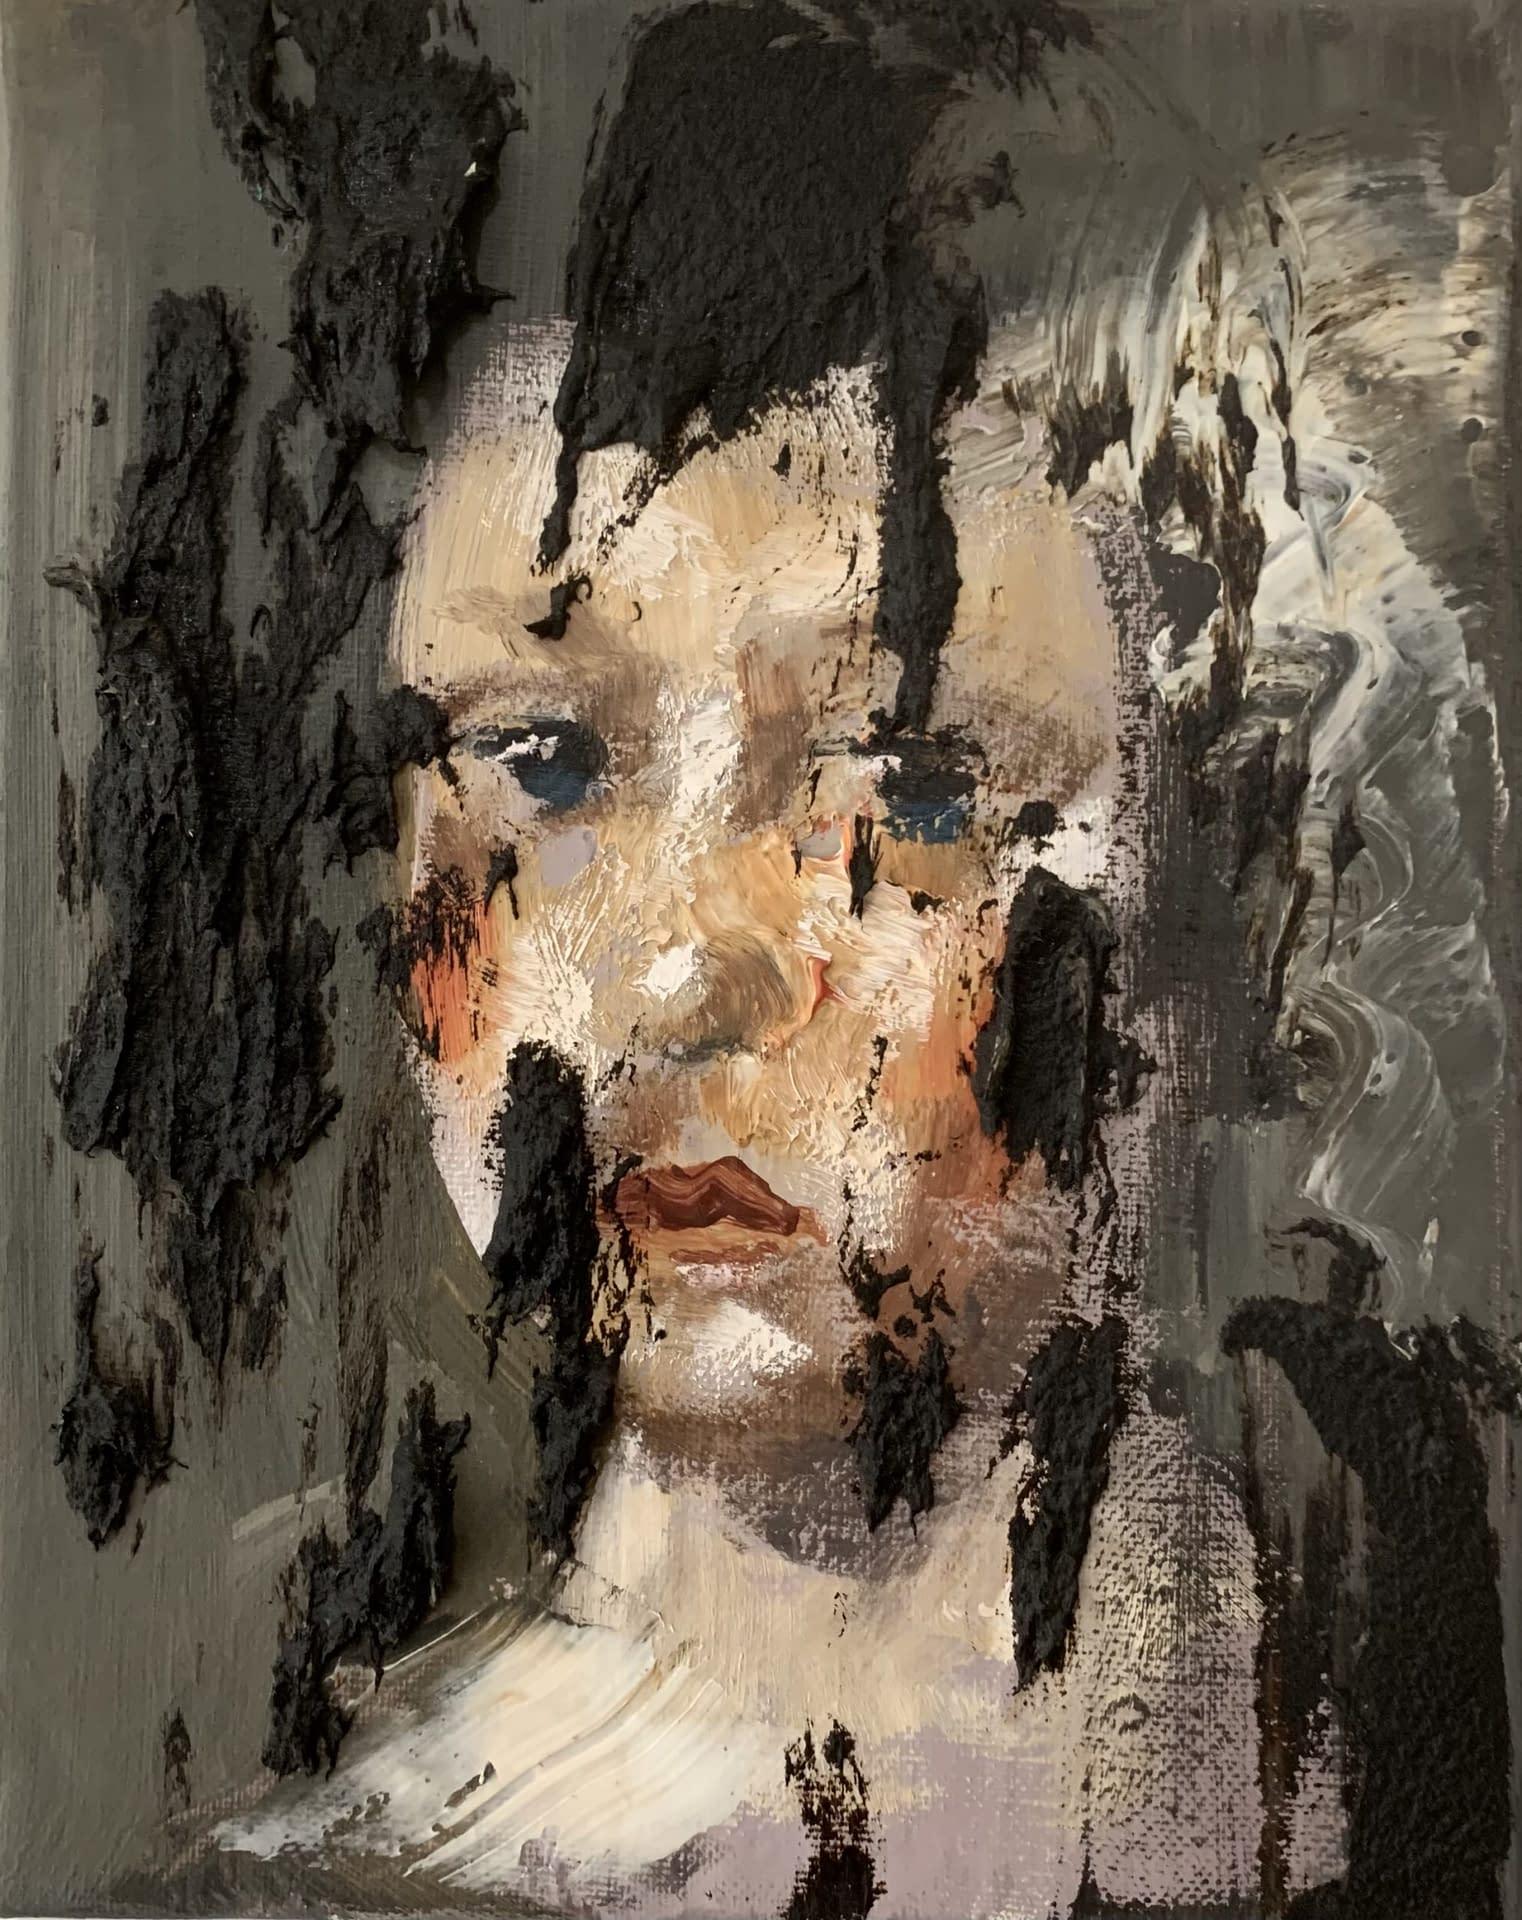 Disillusioned_Martin_Adalian_acrylic_oil_tar_on_canvas_10_x_8